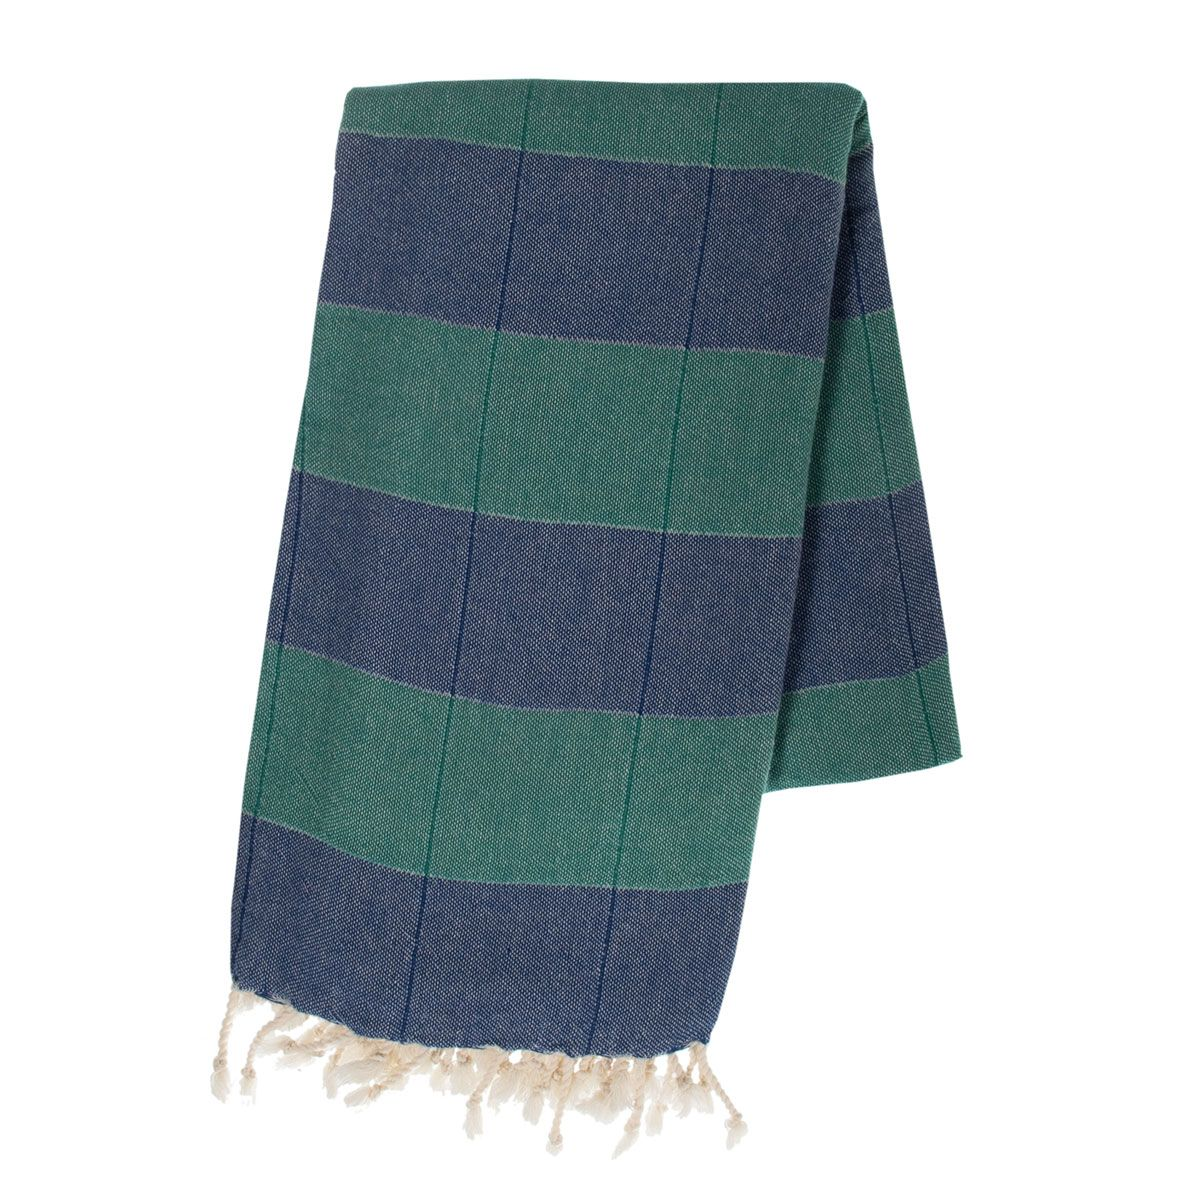 Peştemal Duble - Royal Mavi / Fanfare Yeşil